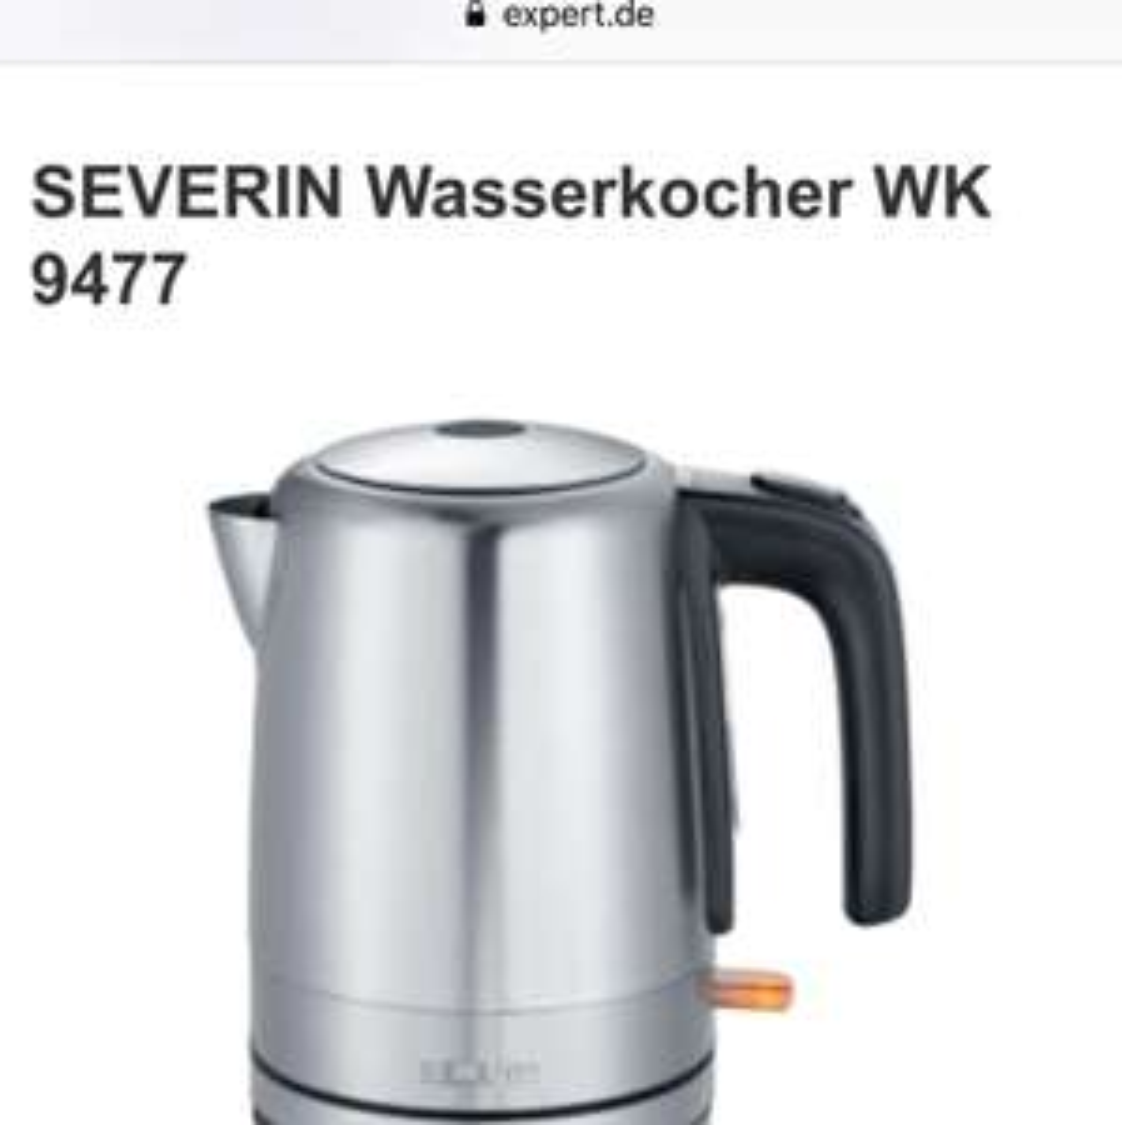 Severin Wasserkocher | online bestellbar + 3,99 Versand